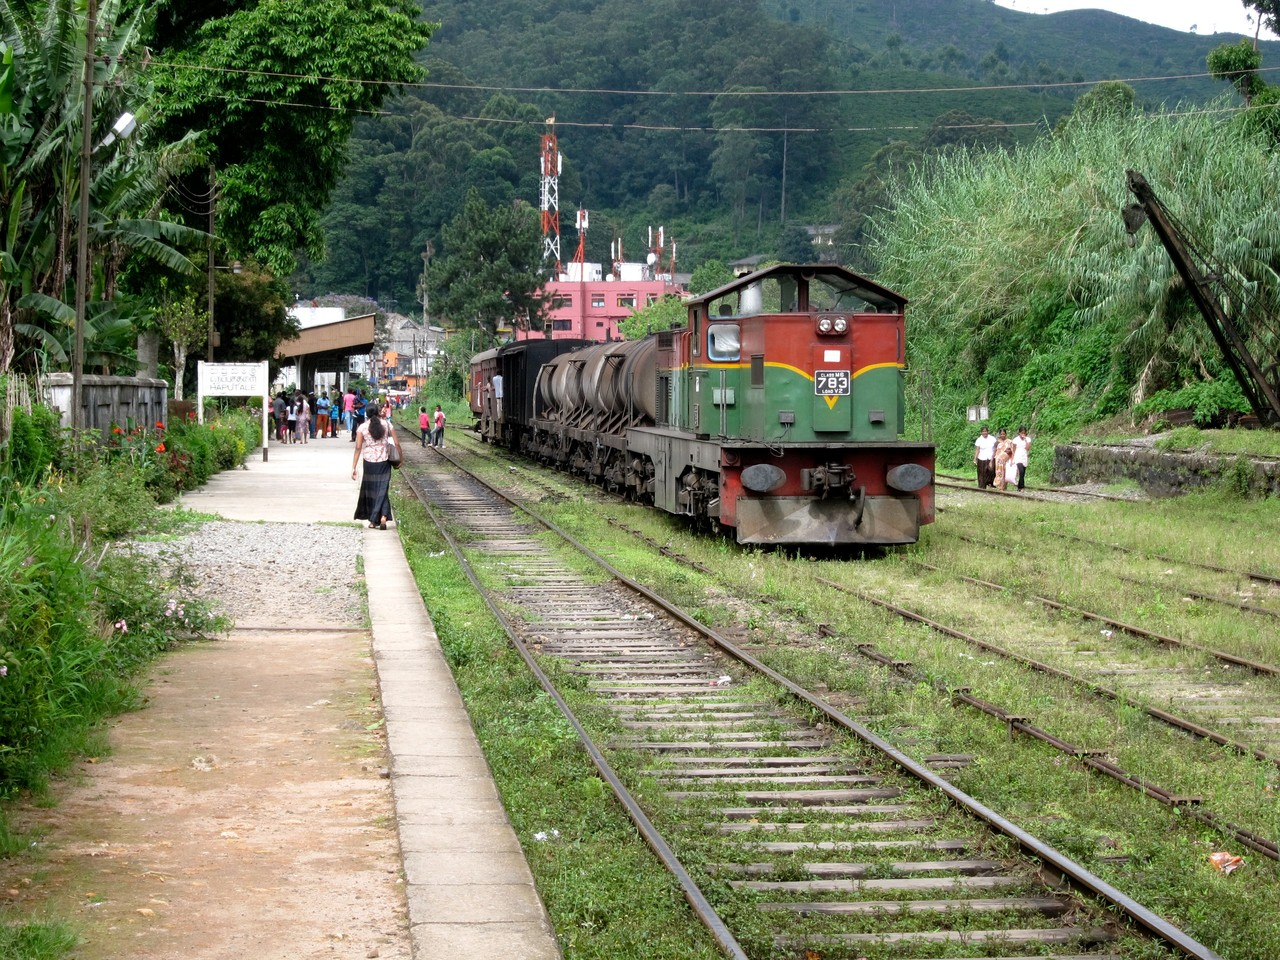 Bahnhof Haputale, Zugfahrt ins Hochland von Sri Lanka